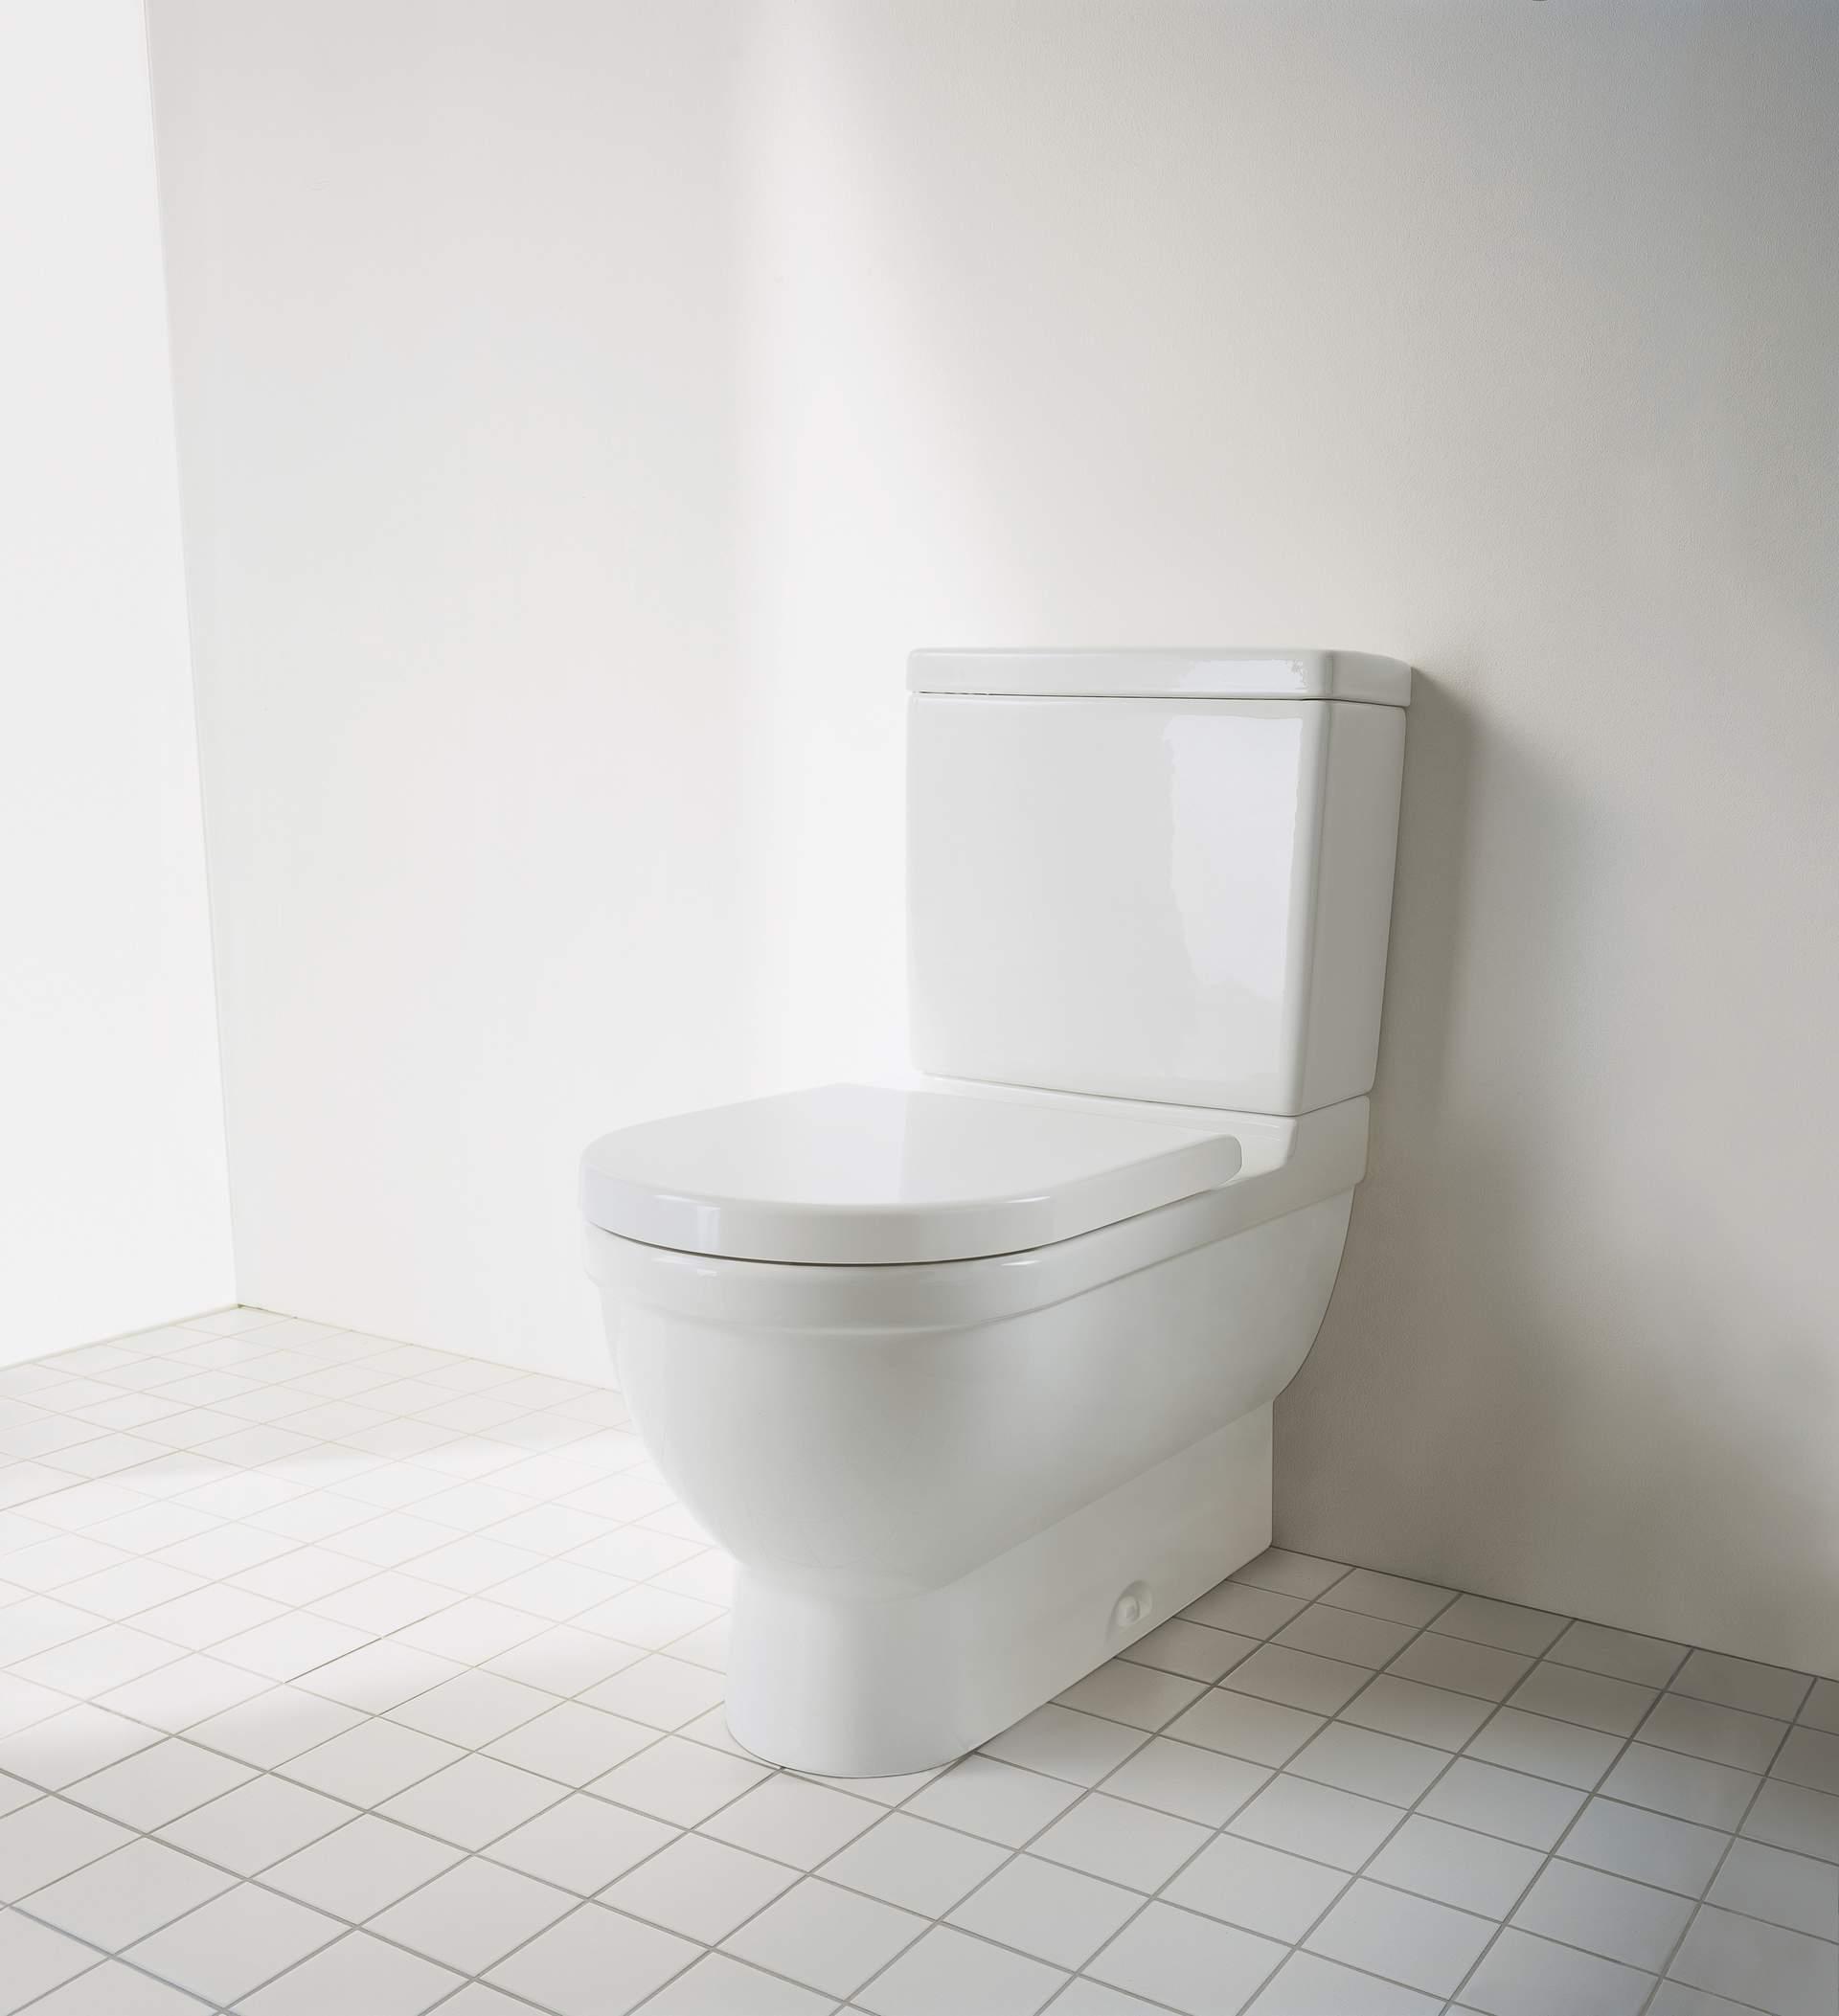 duravit d code cistern instructions